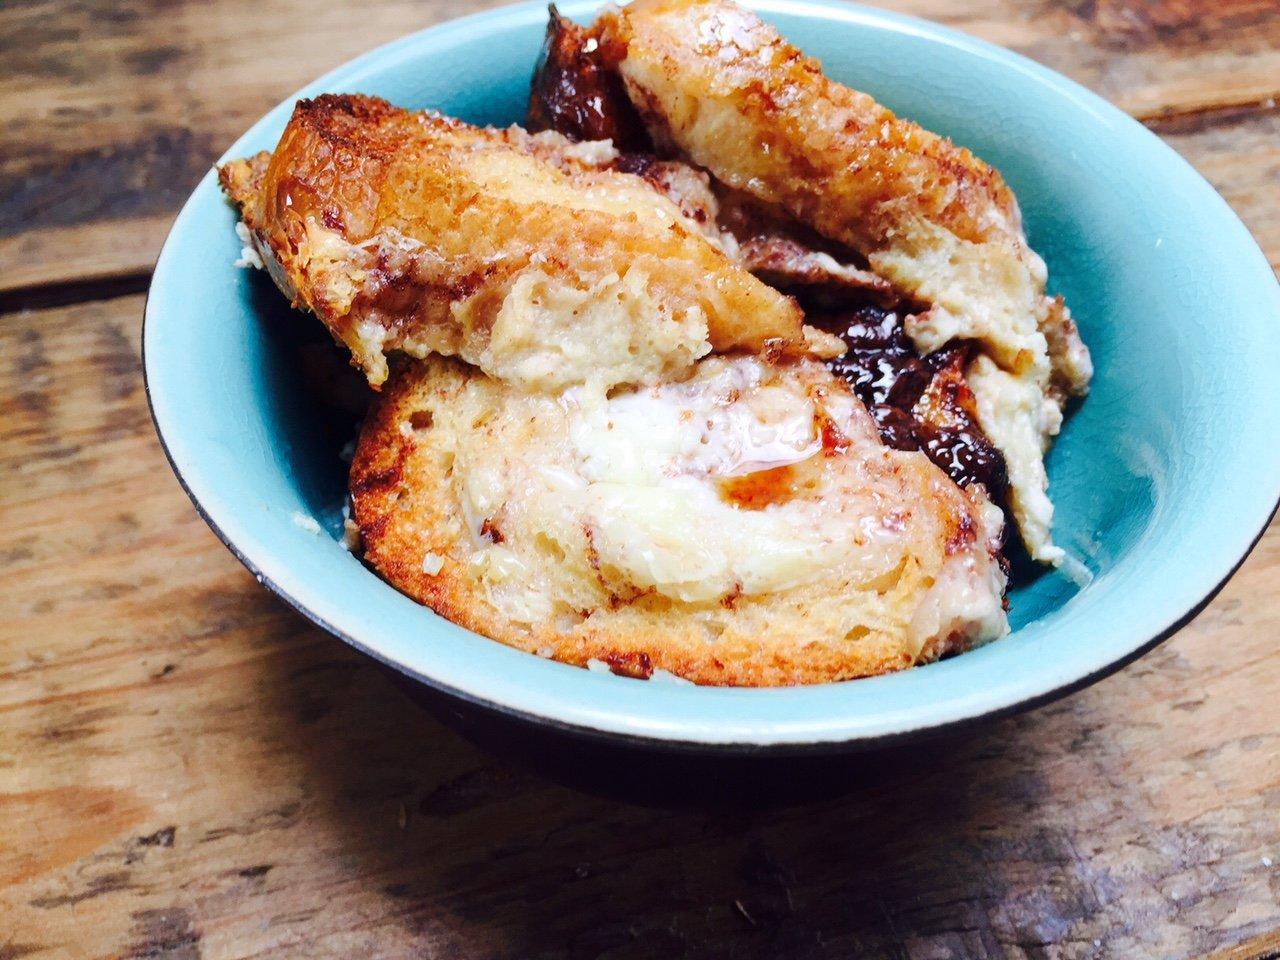 Recept wentelteefjes met Nutella en mascarpone receptblog Foodinista